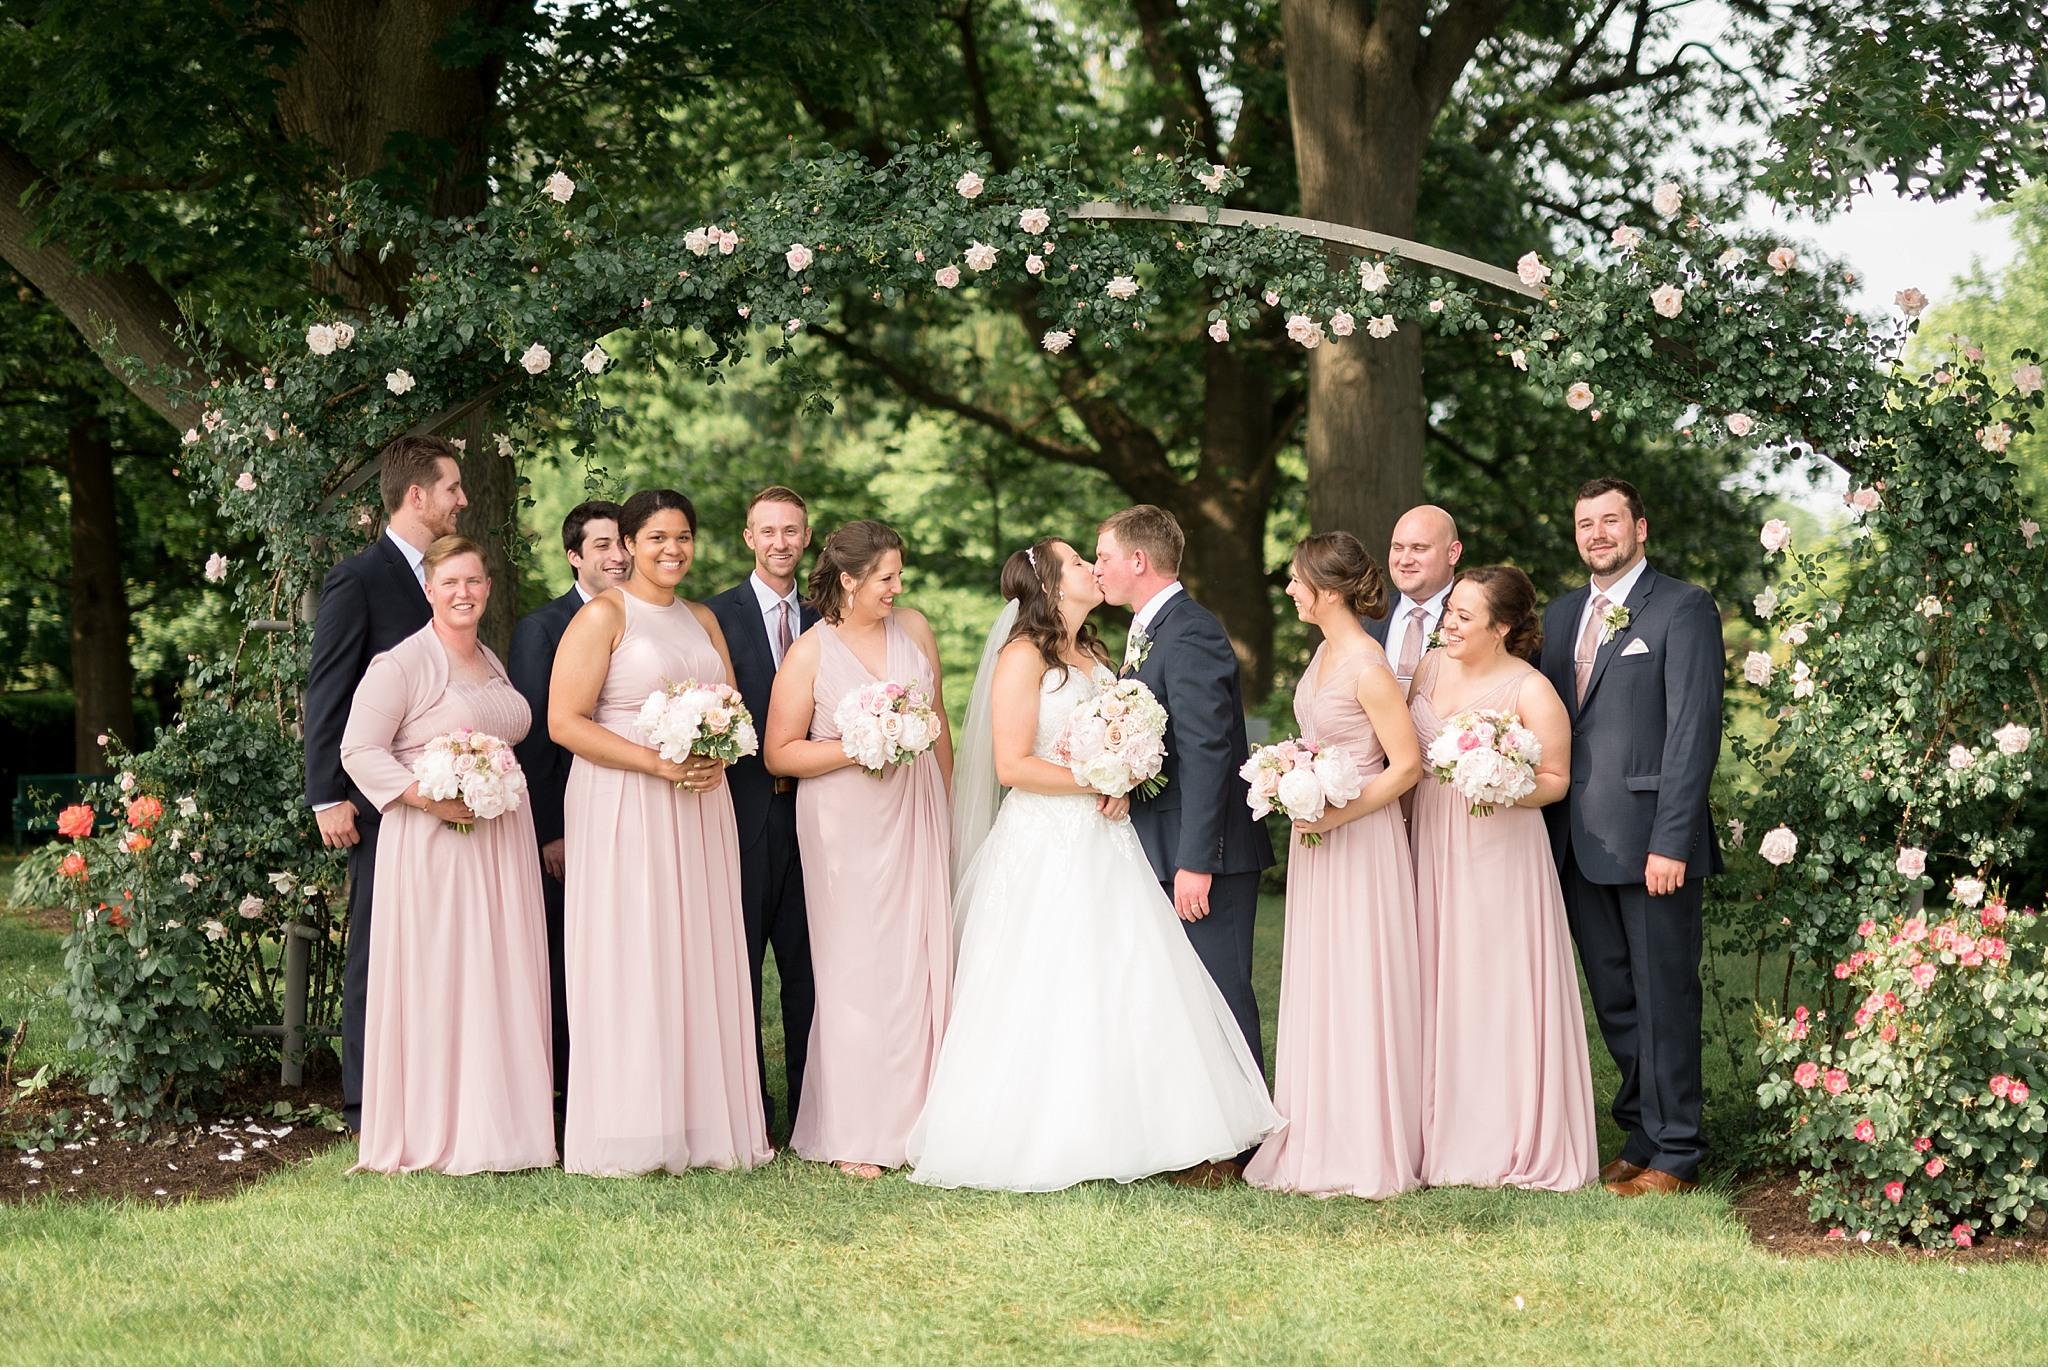 Bridal Party Hershey Gardens Hershey Country Club Summer beautiful wedding photography_1588.jpg